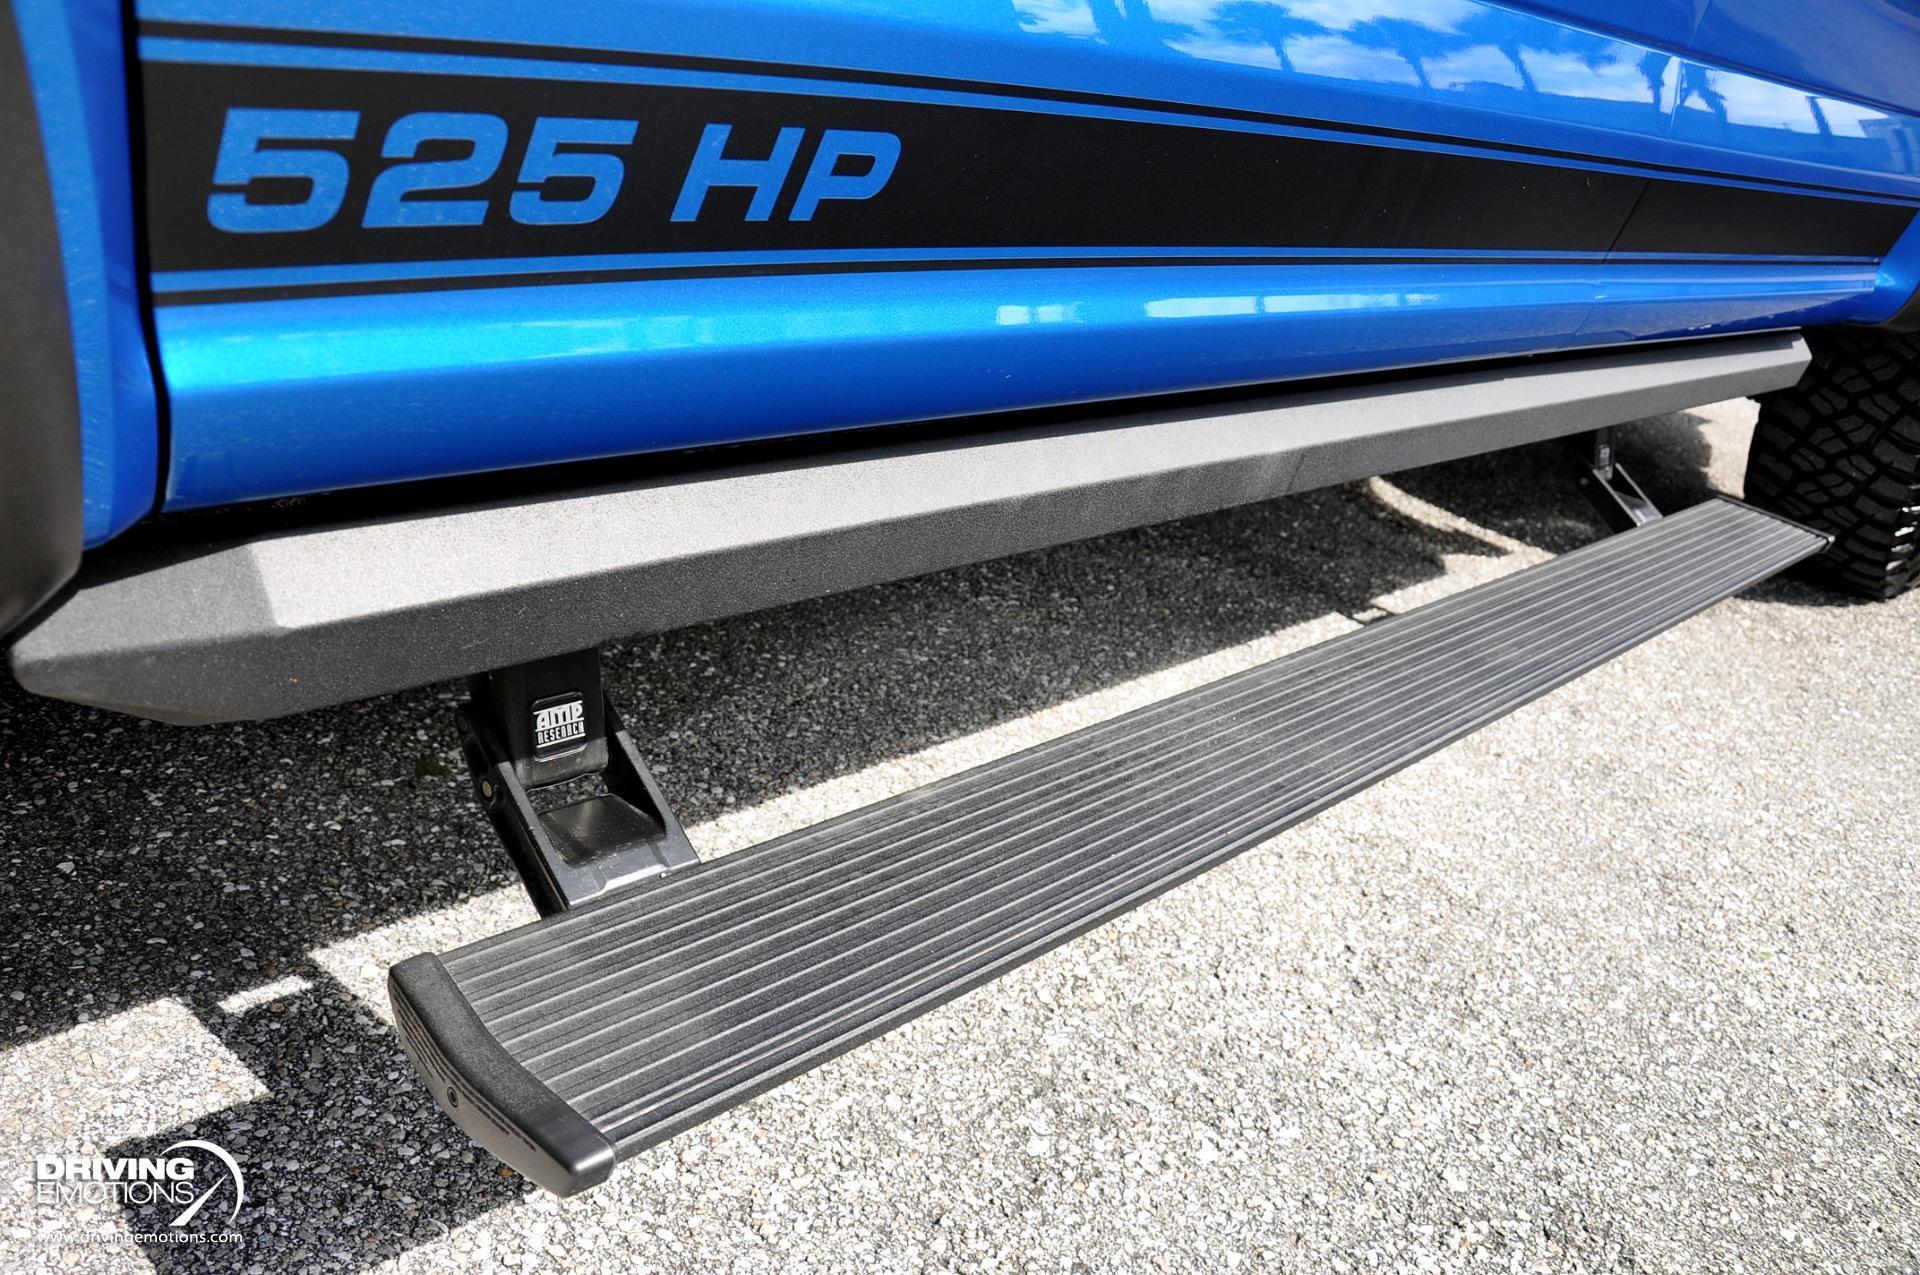 Used 2020 Ford F-150 Raptor Shelby Baja 525HP! $122k MSRP! | Lake Park, FL